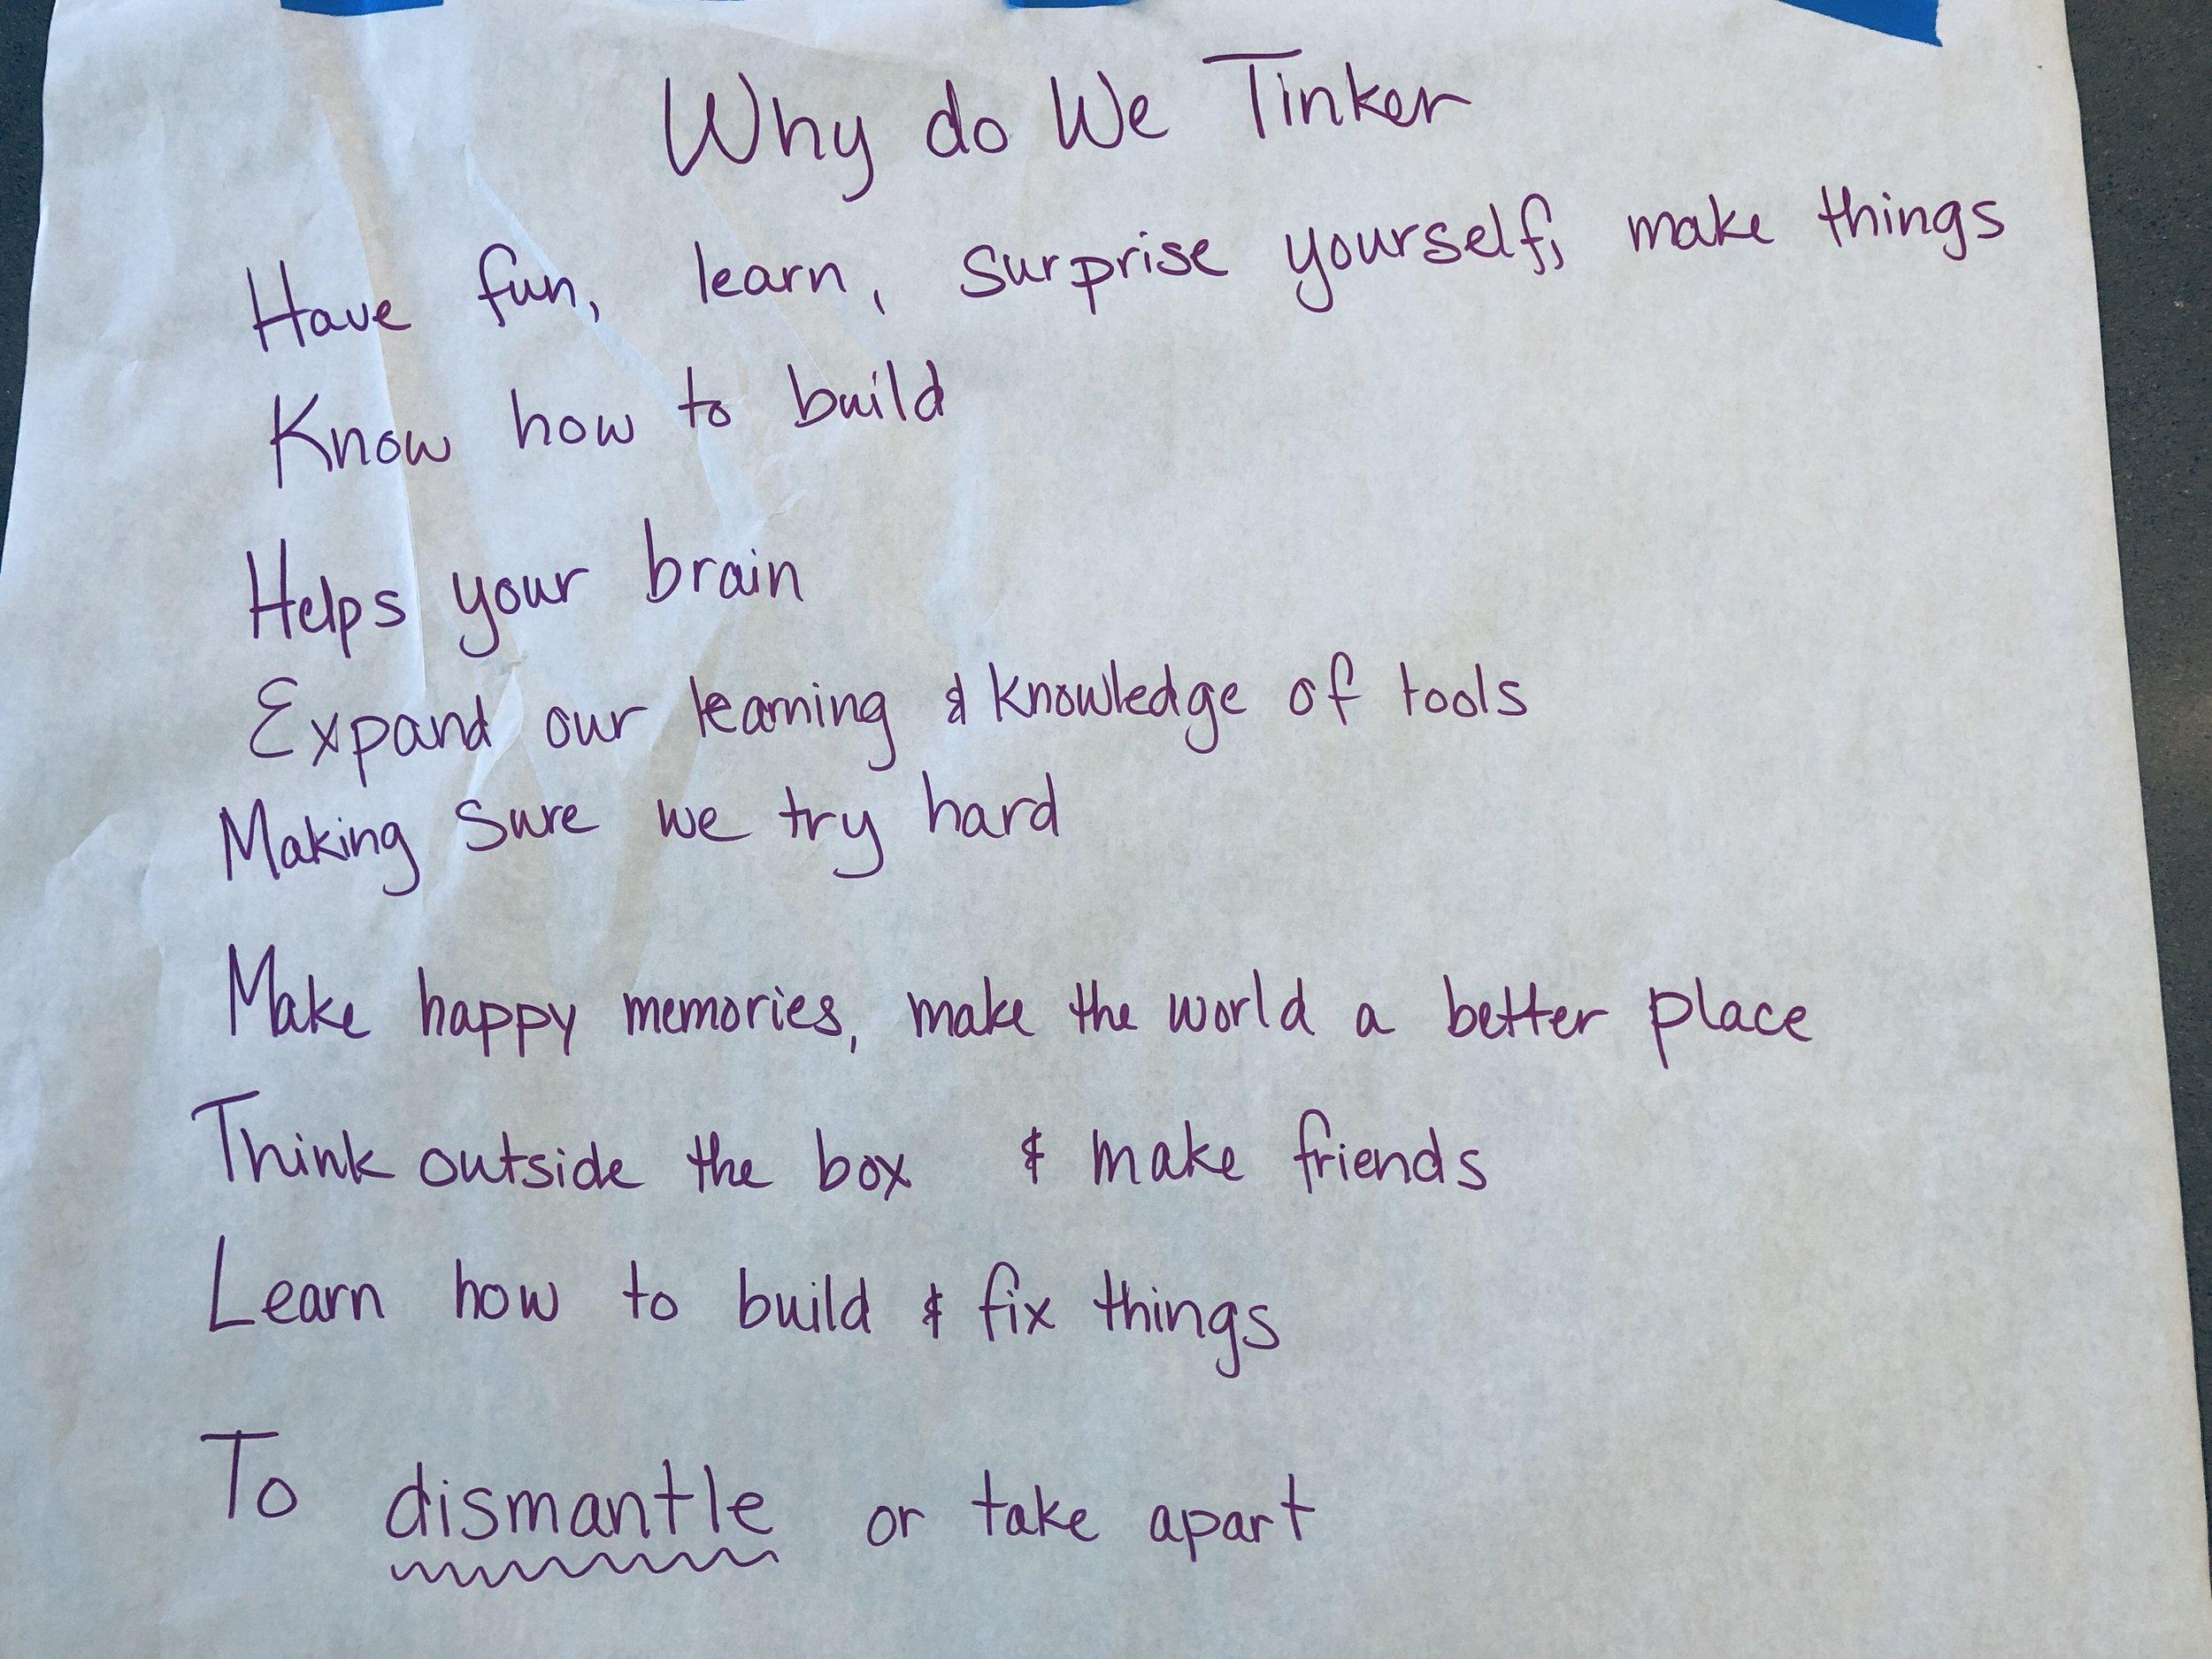 Why do we Tinker summary.jpg